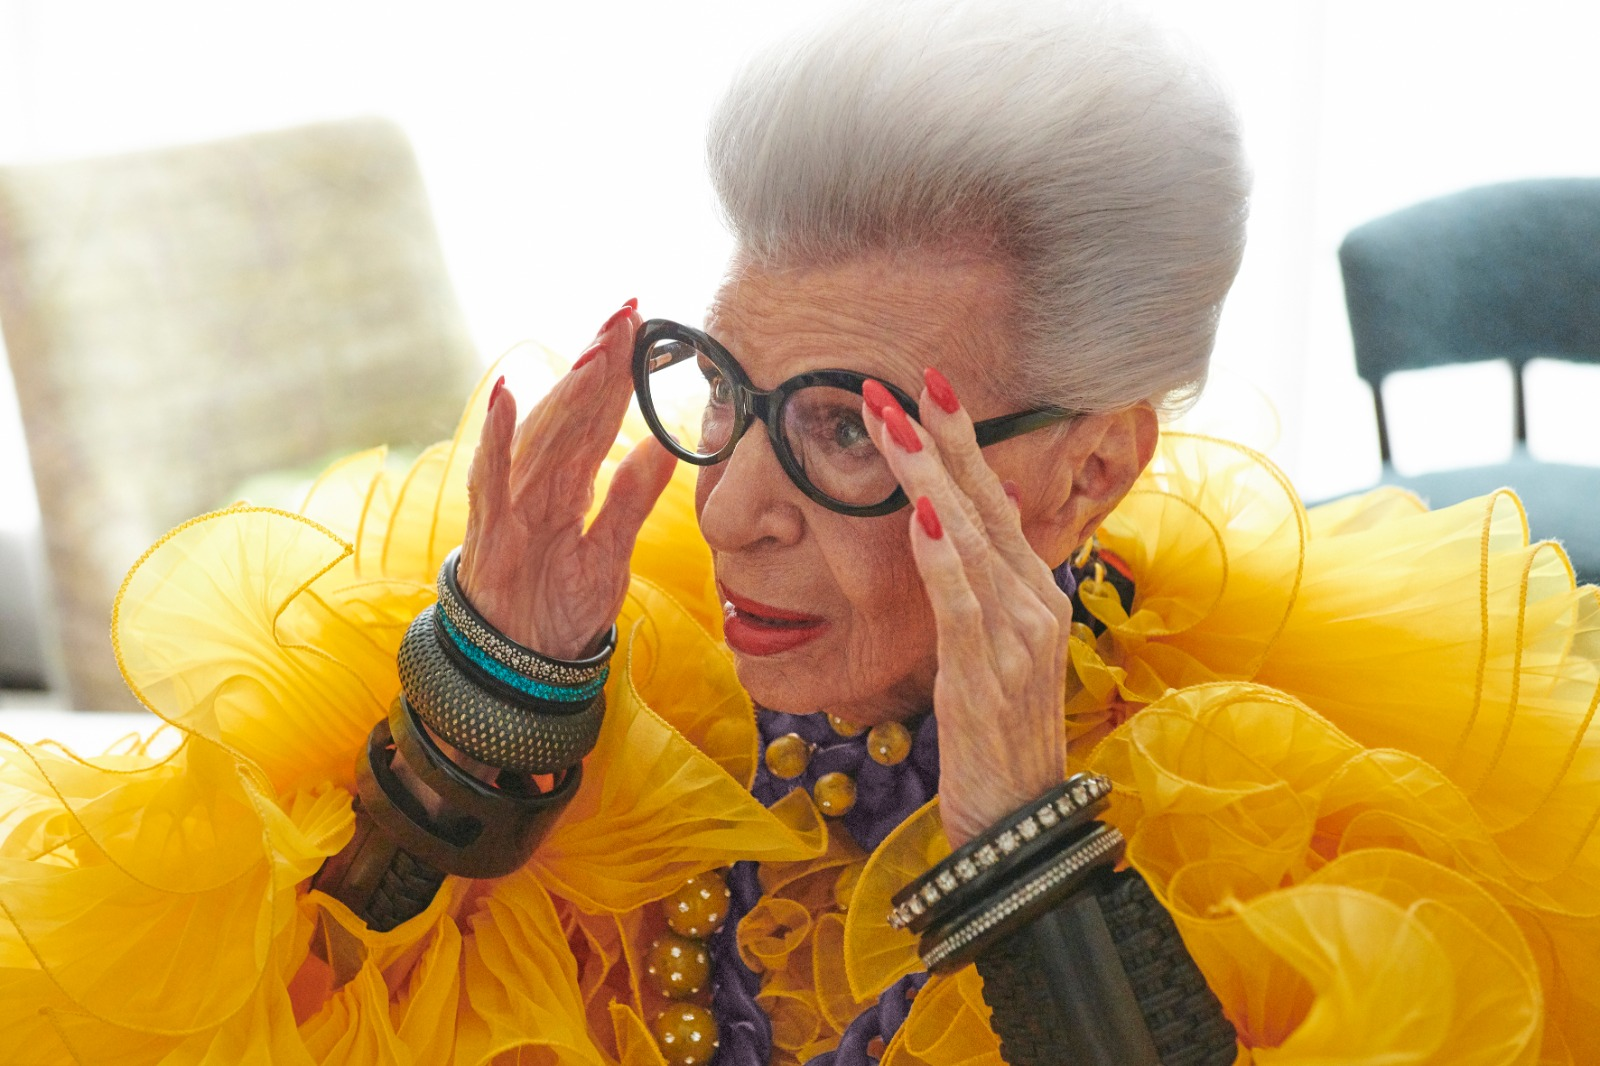 Iris Apfel recently celebrated her 100th birthday.